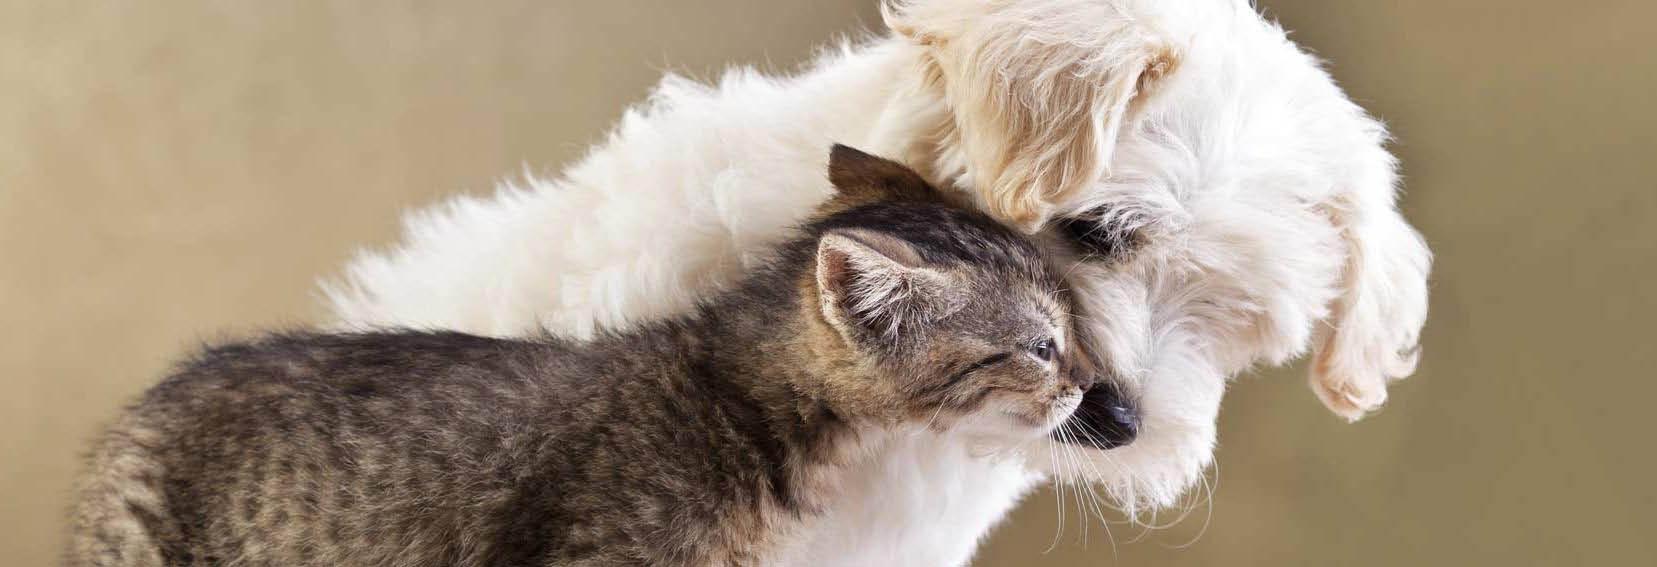 cat adoption shelters, local pet adoption centers, adopting animals from shelters  Phoenix, AZ